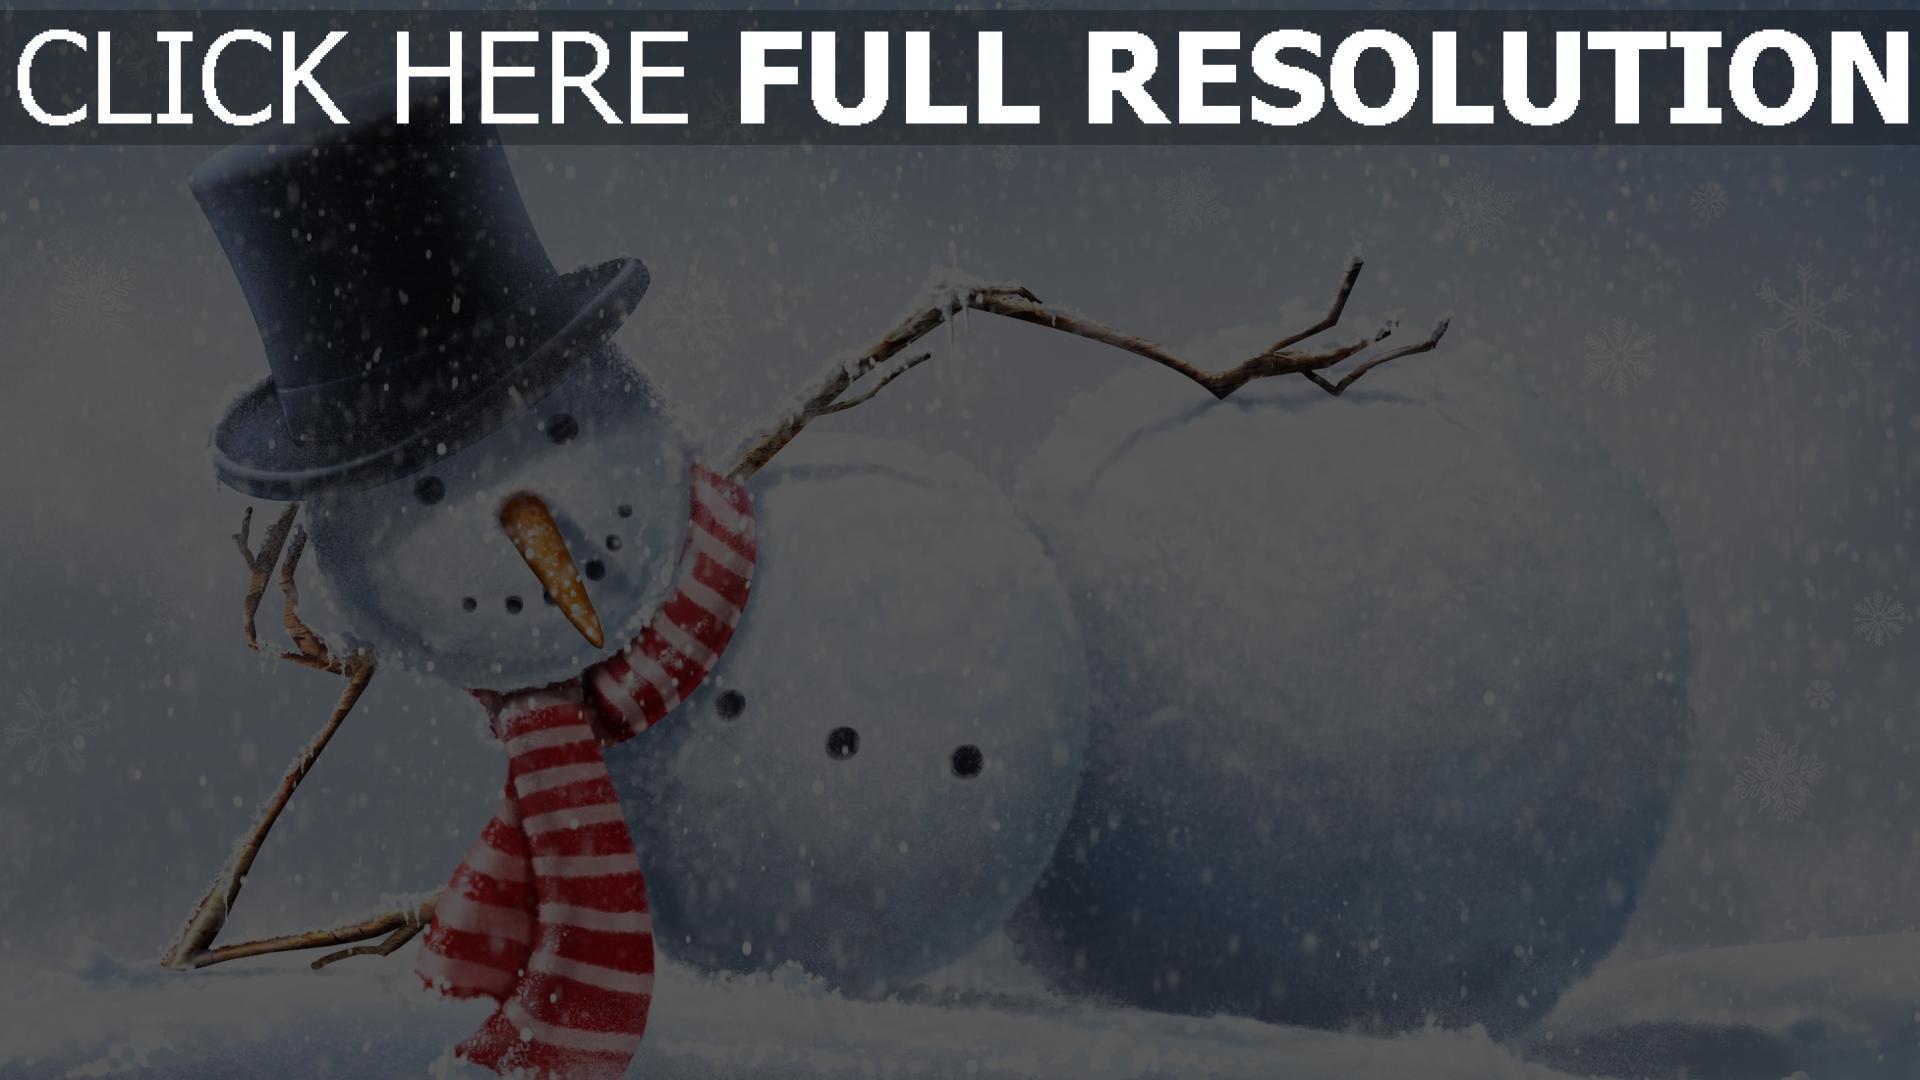 Božićne slike, predivni wallpaperi za download